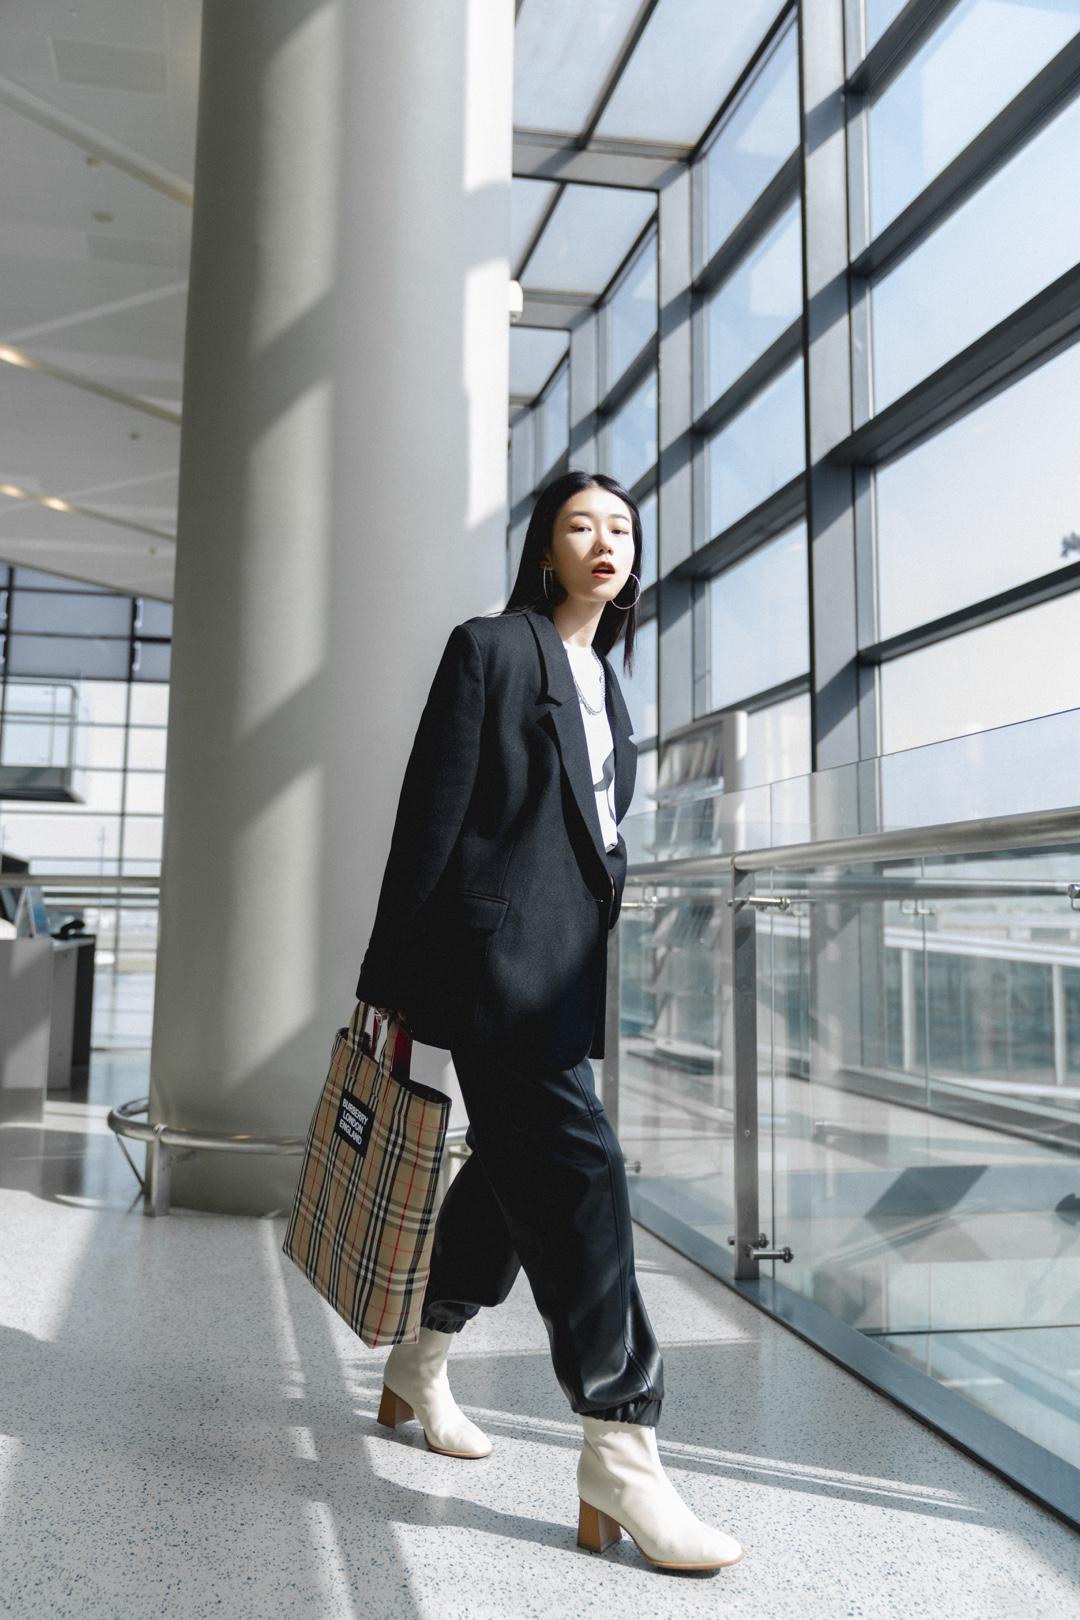 #Ava搭配日记#分享一组前几天肠胃炎还在机场坚持营业的A姐,真是太南了😭  西装:low classic  T恤:MichaelKors  裤子:ZARA  高跟鞋:BELLE 包包:Burberry